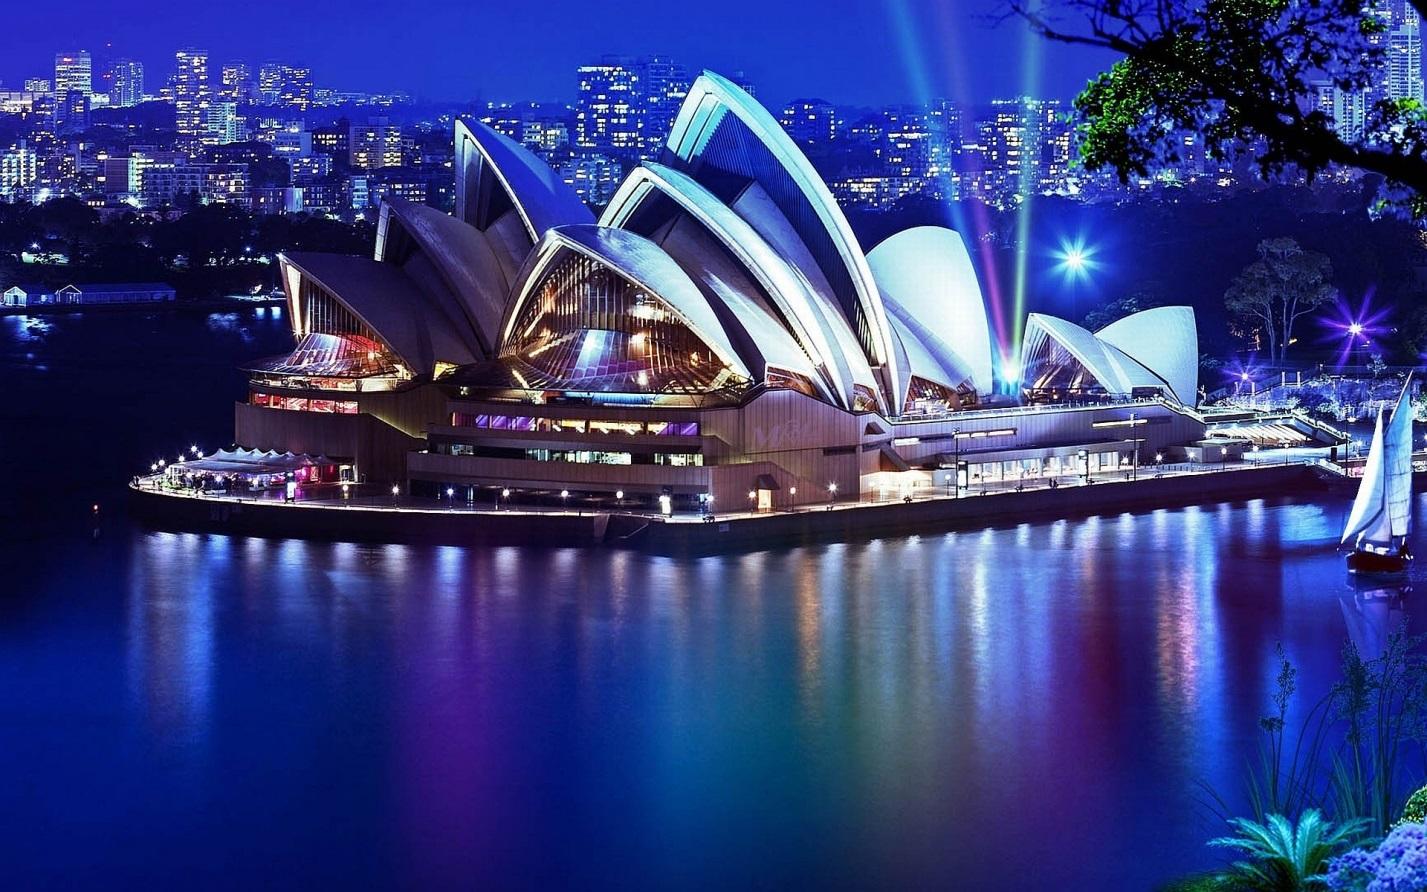 rentalcars24h blog sydney park2 #1 Sydney Sight To Admire Australian Nature!